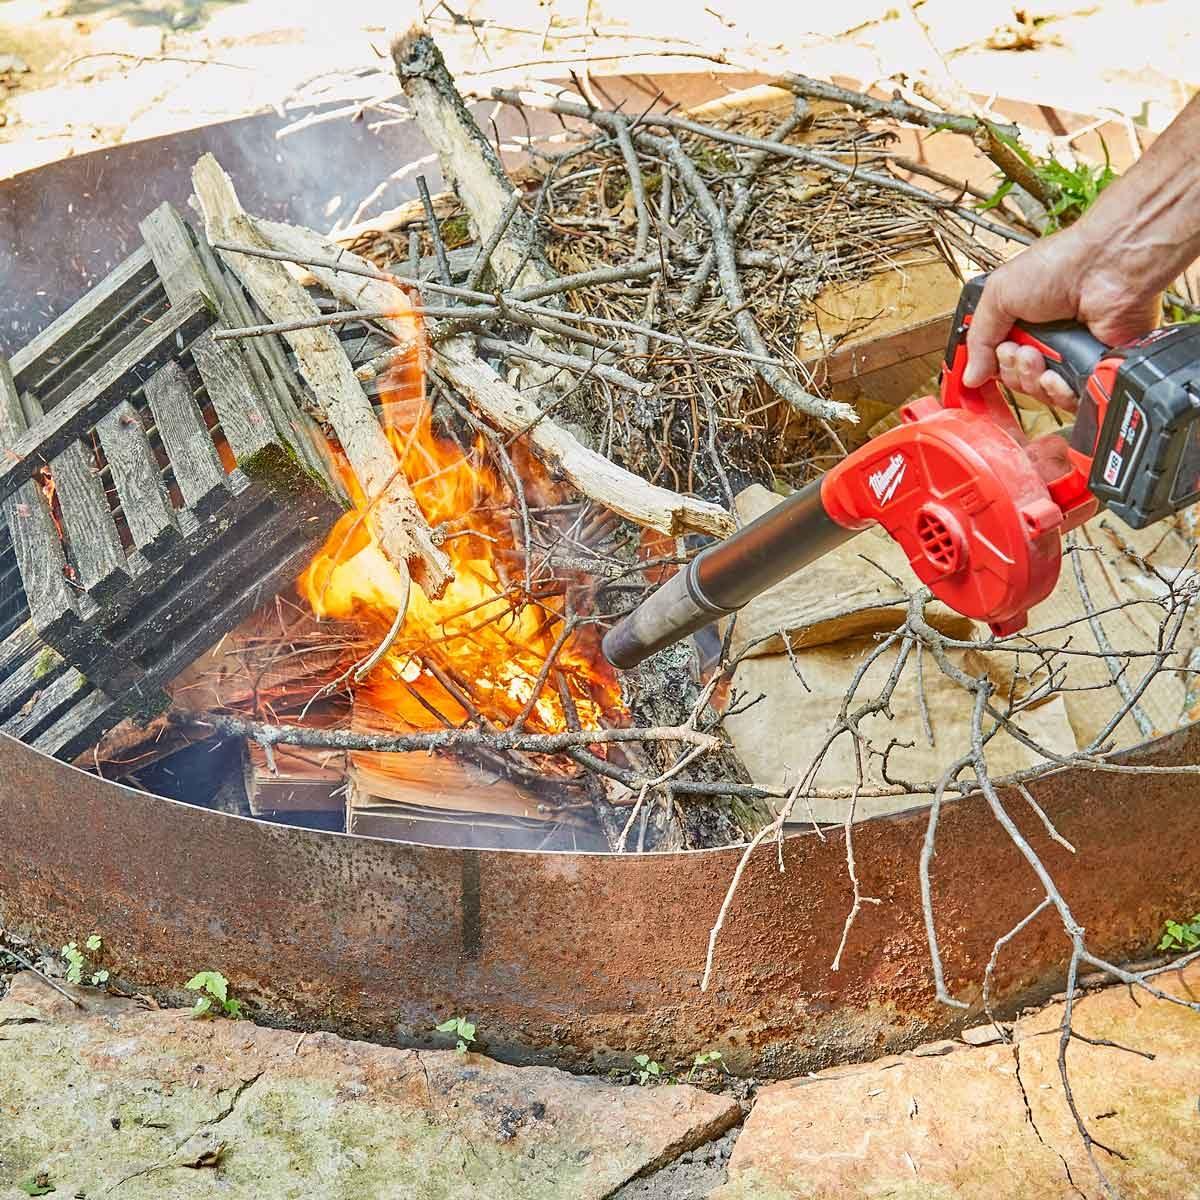 leaf blower to start fire